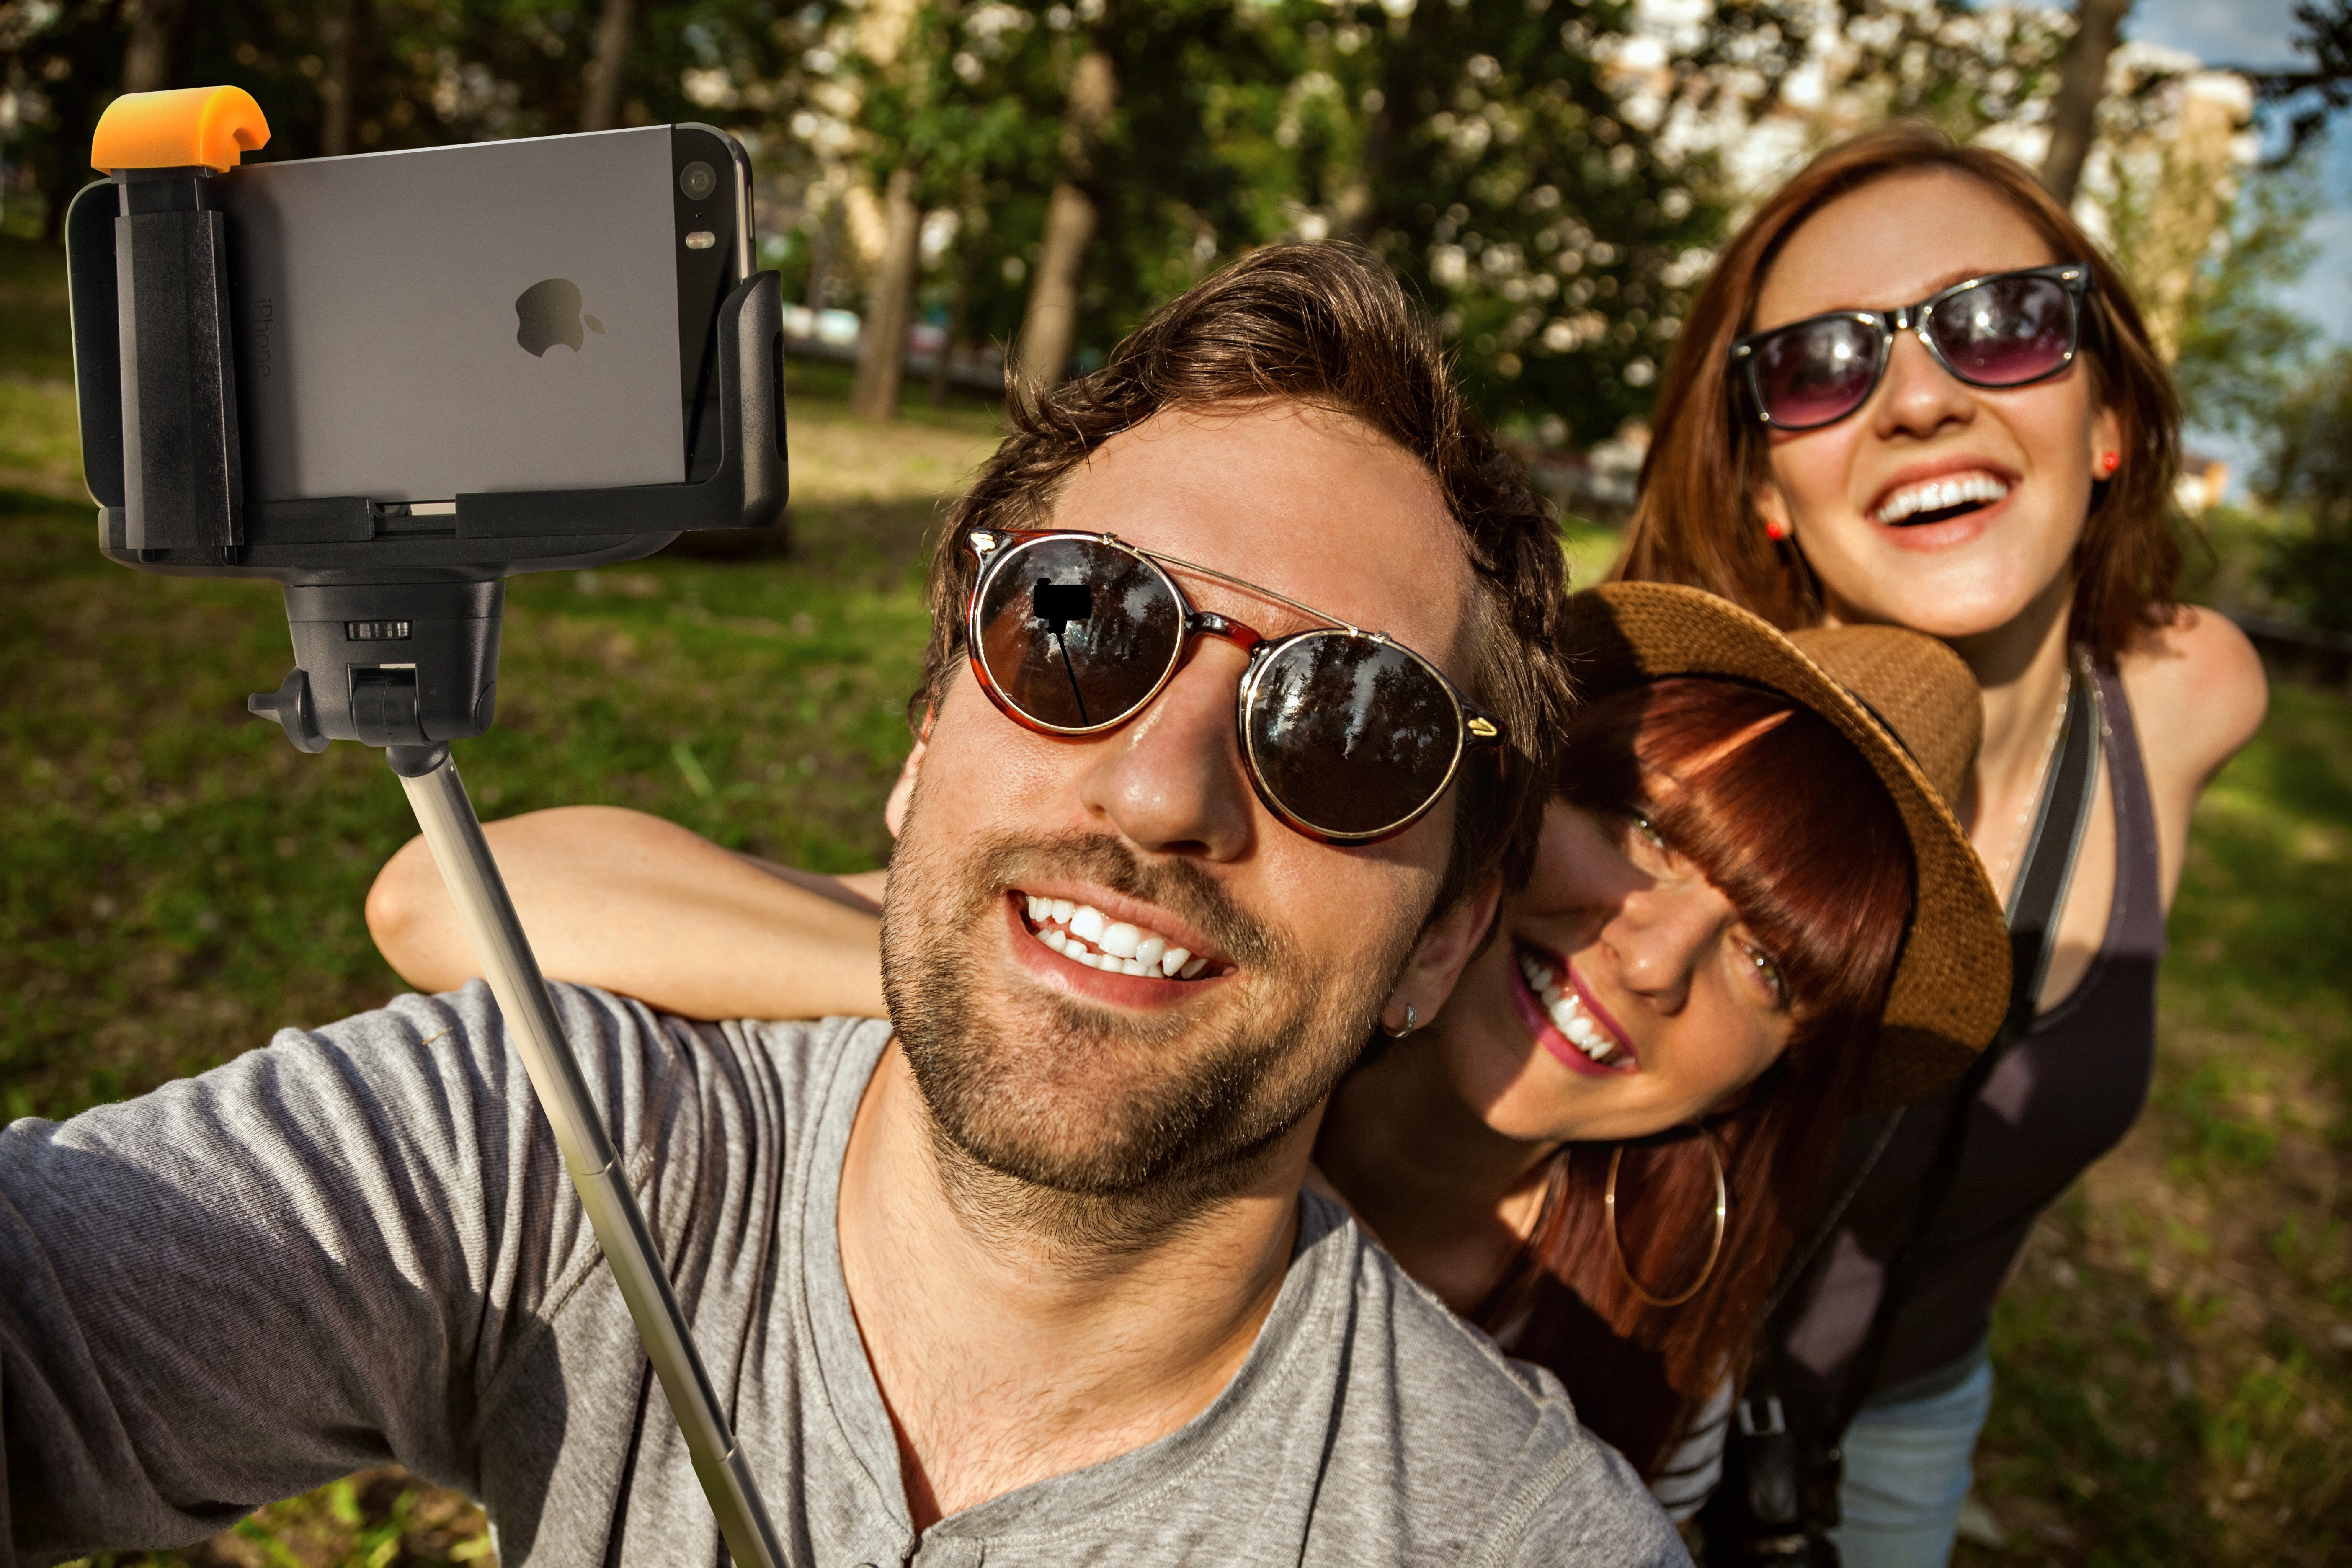 selfie stick selfie with friends